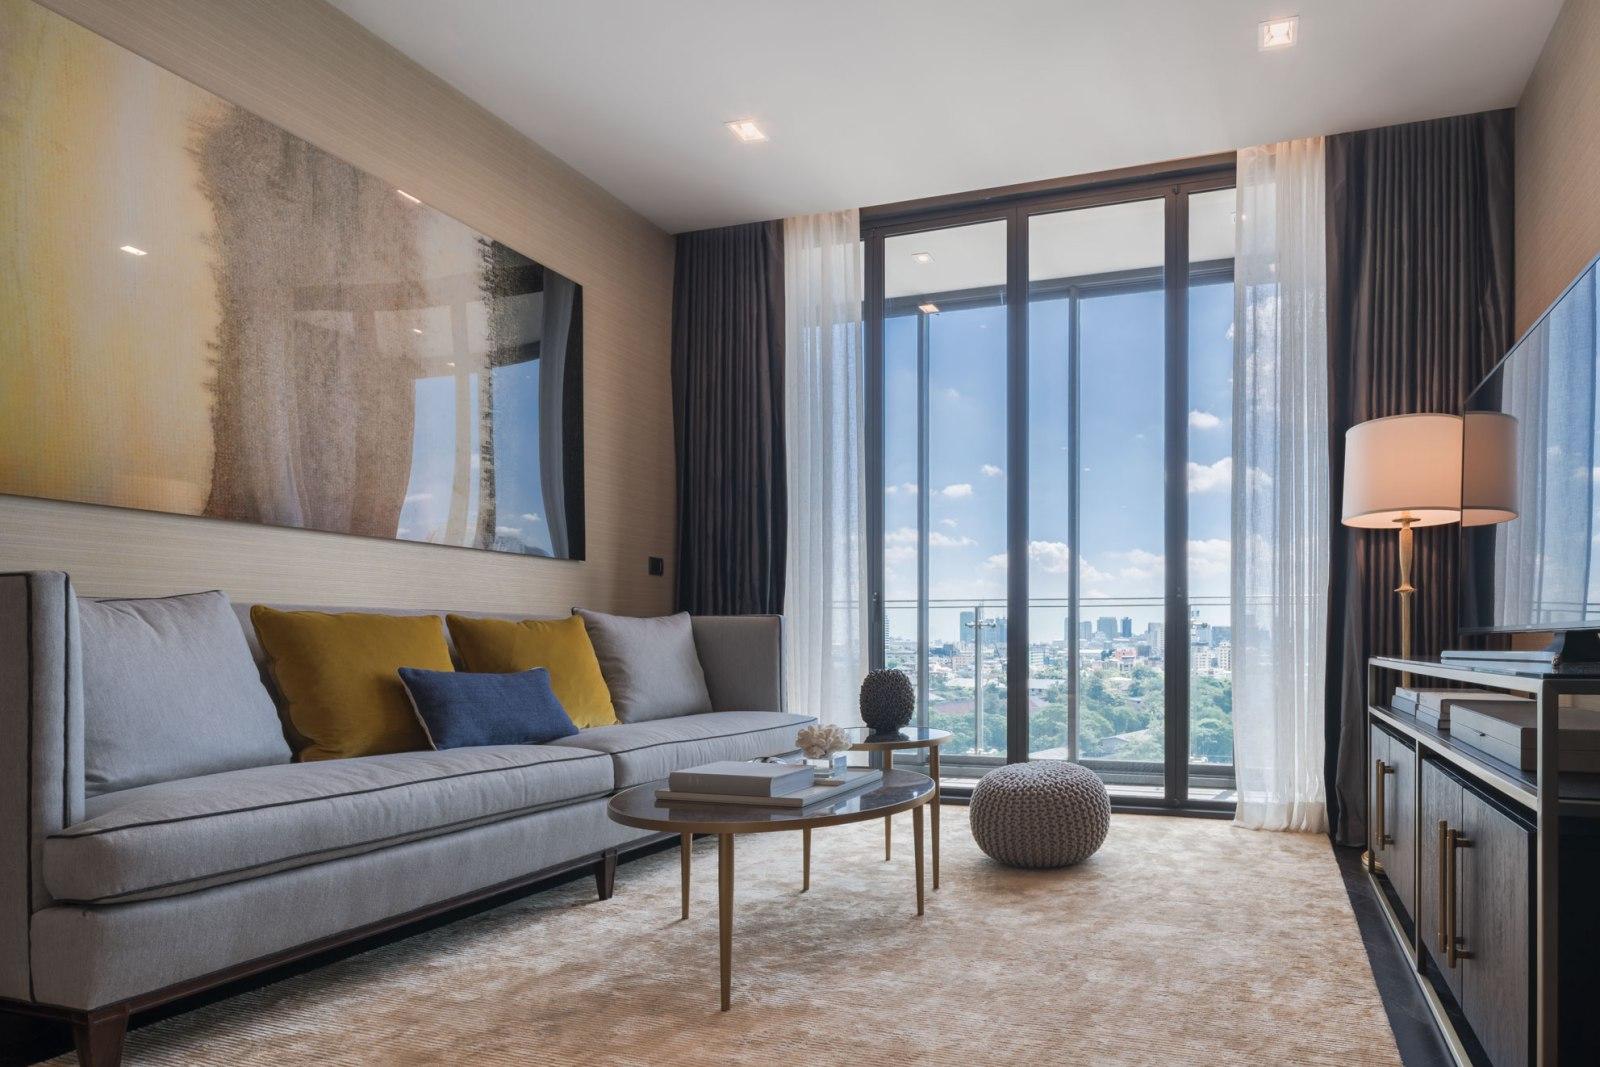 Phuket Real Estate Agency – Thailand – Bangkok – The Monument Sanampao (52)